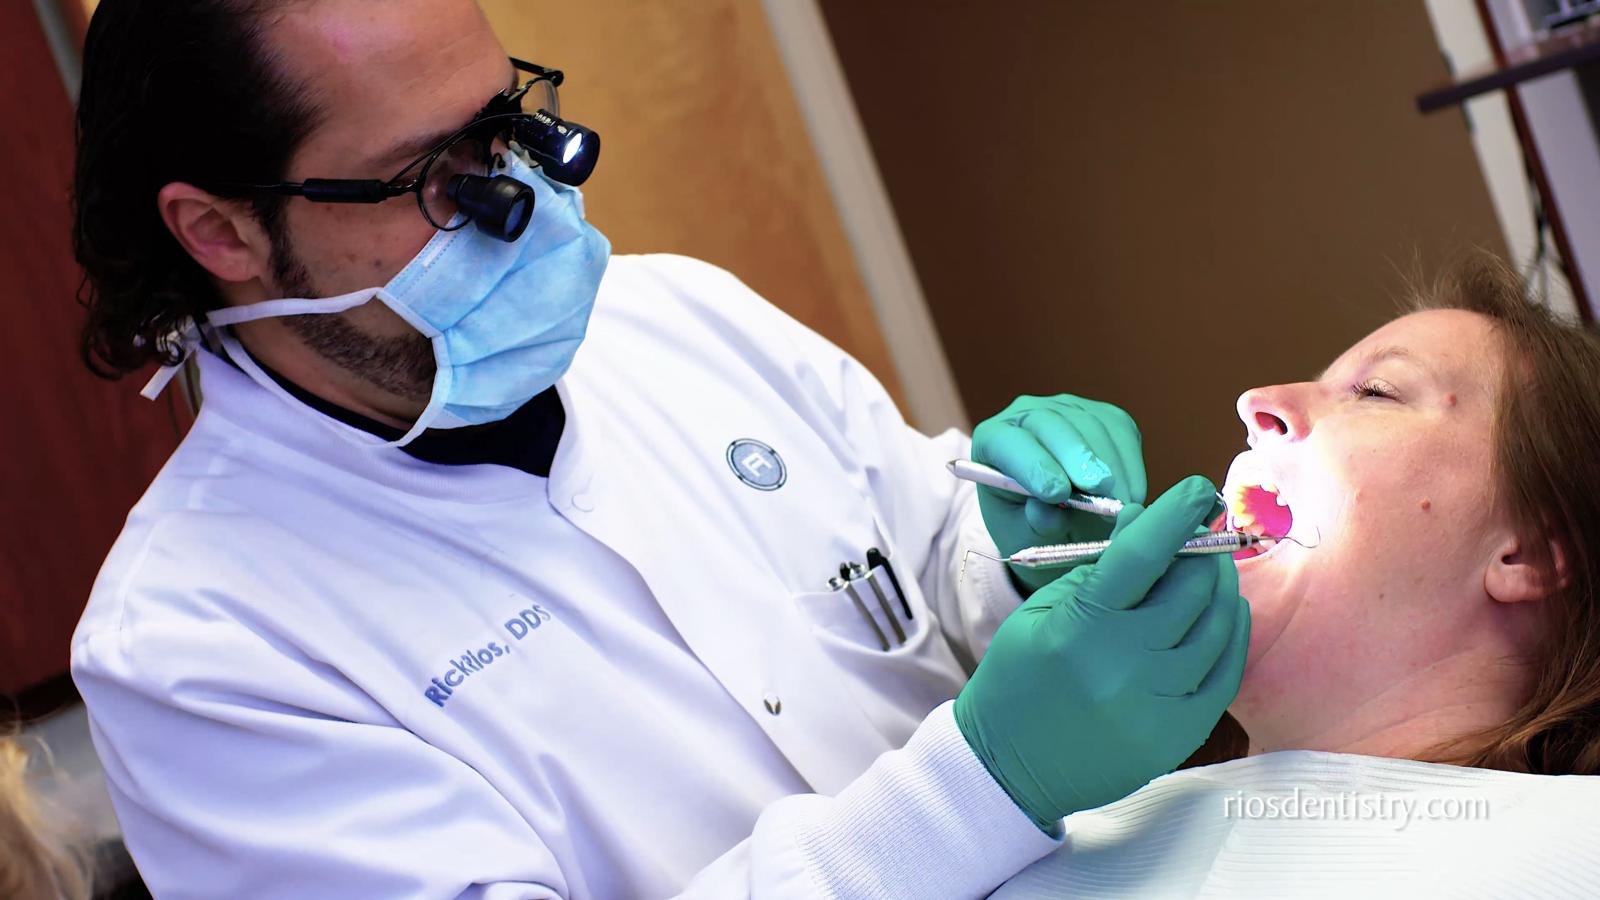 Rios Dentistry